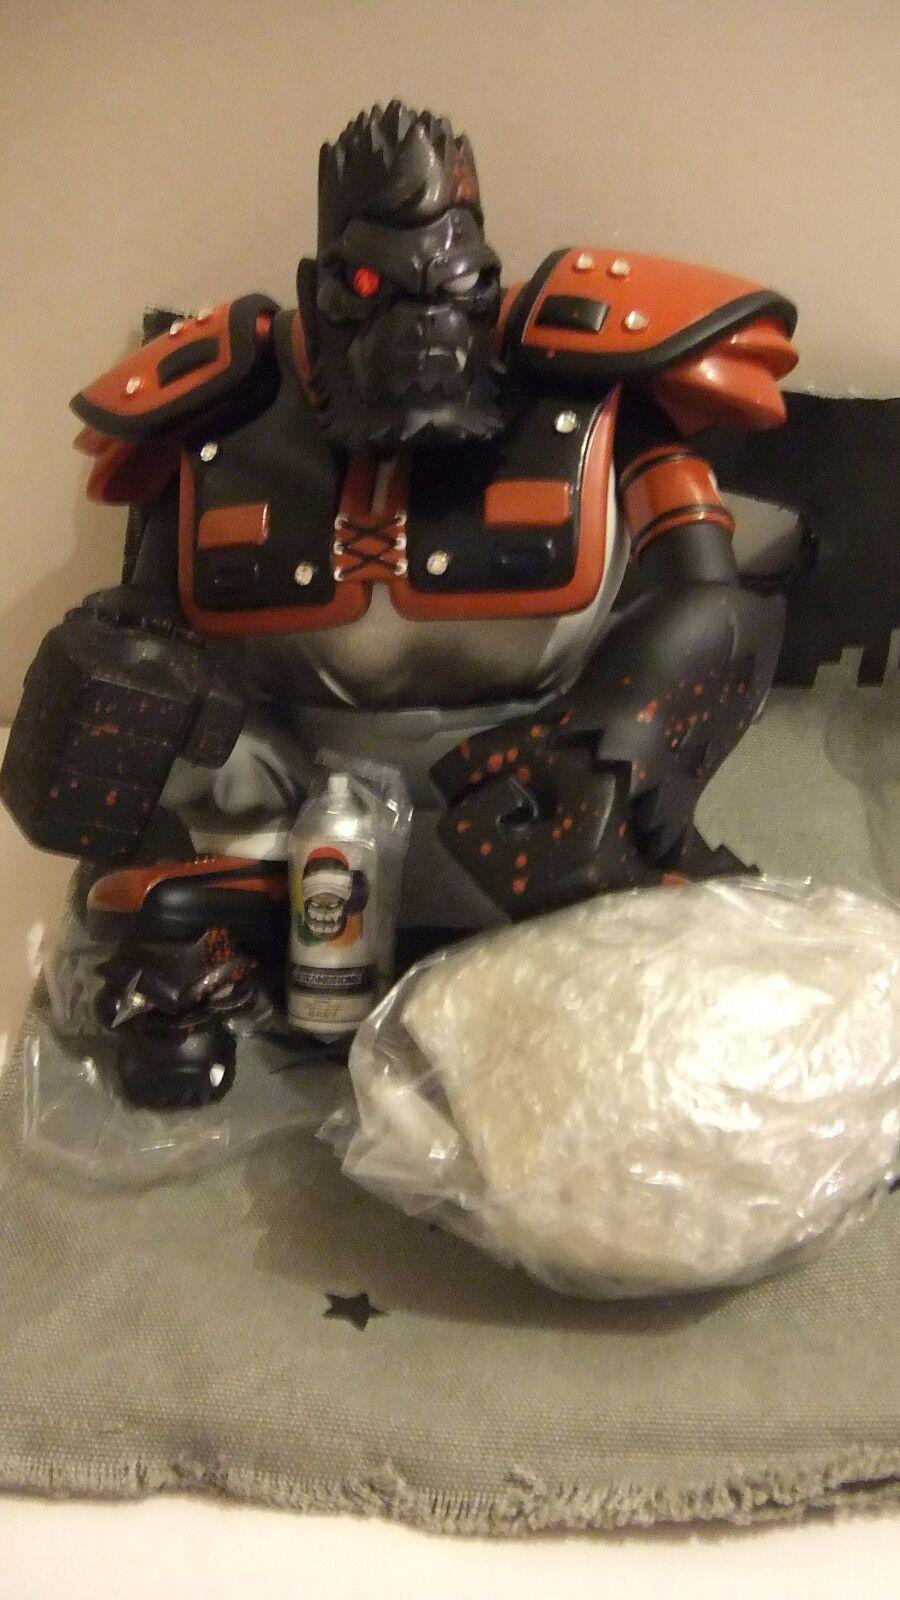 Tim Tsui Da Warrior DateamBronx Red mega rare Blood Diamond Ed. Kidrobot dunny